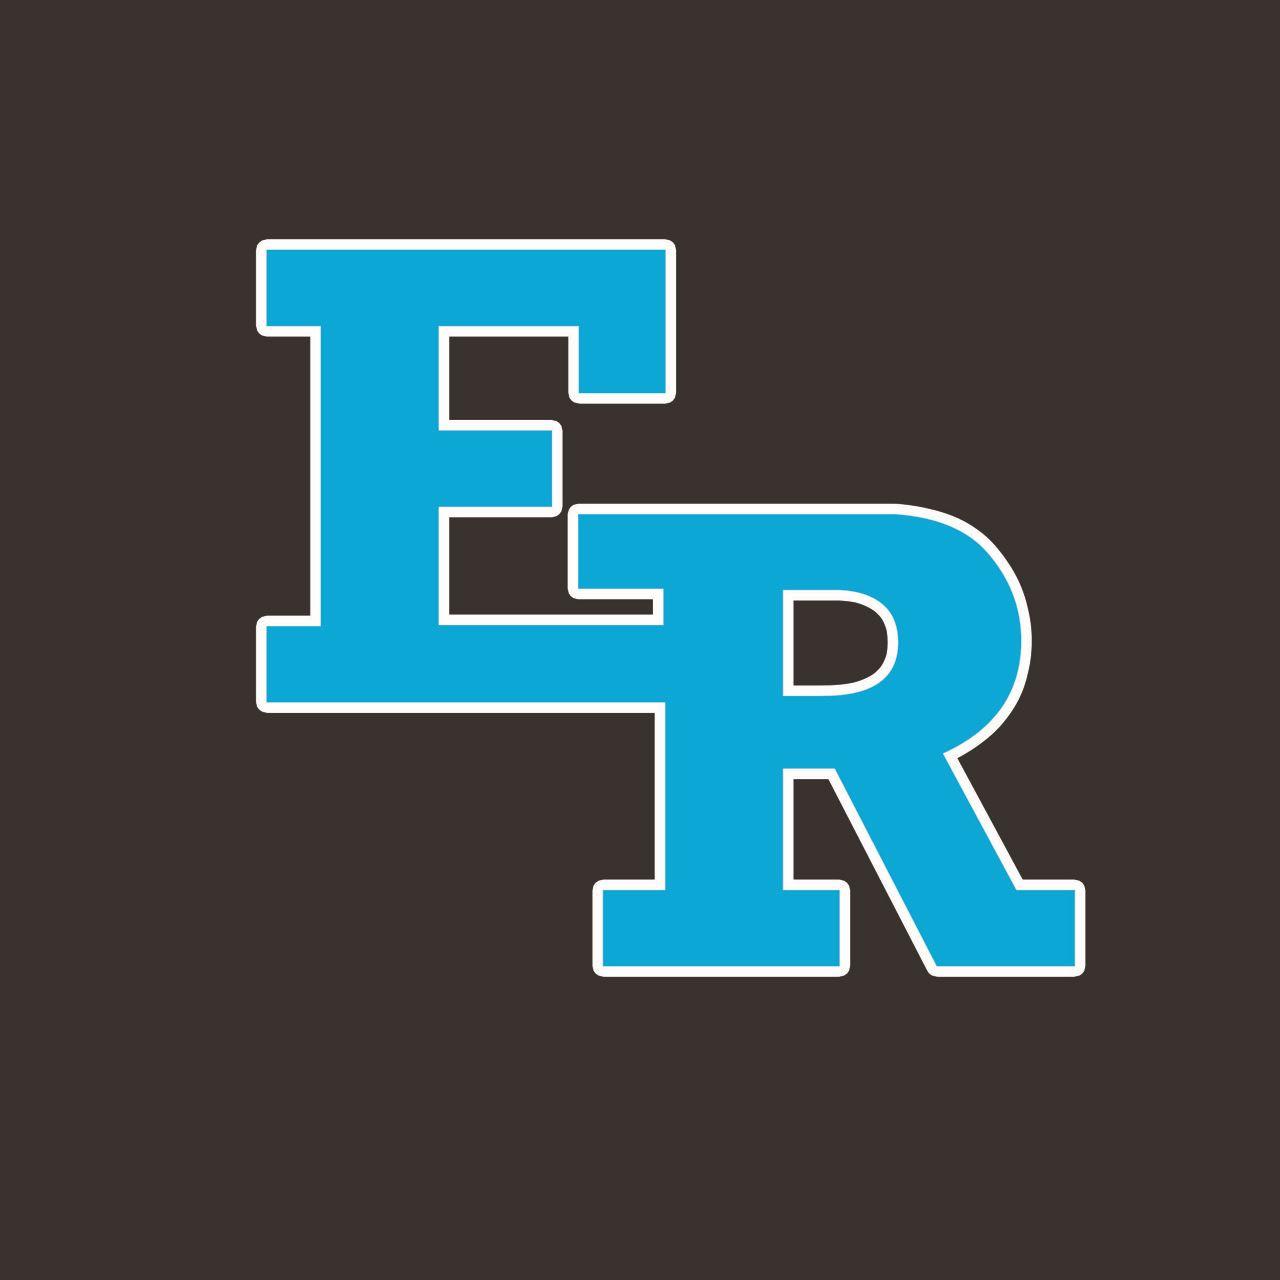 Eleanor Roosevelt High School - JV Football